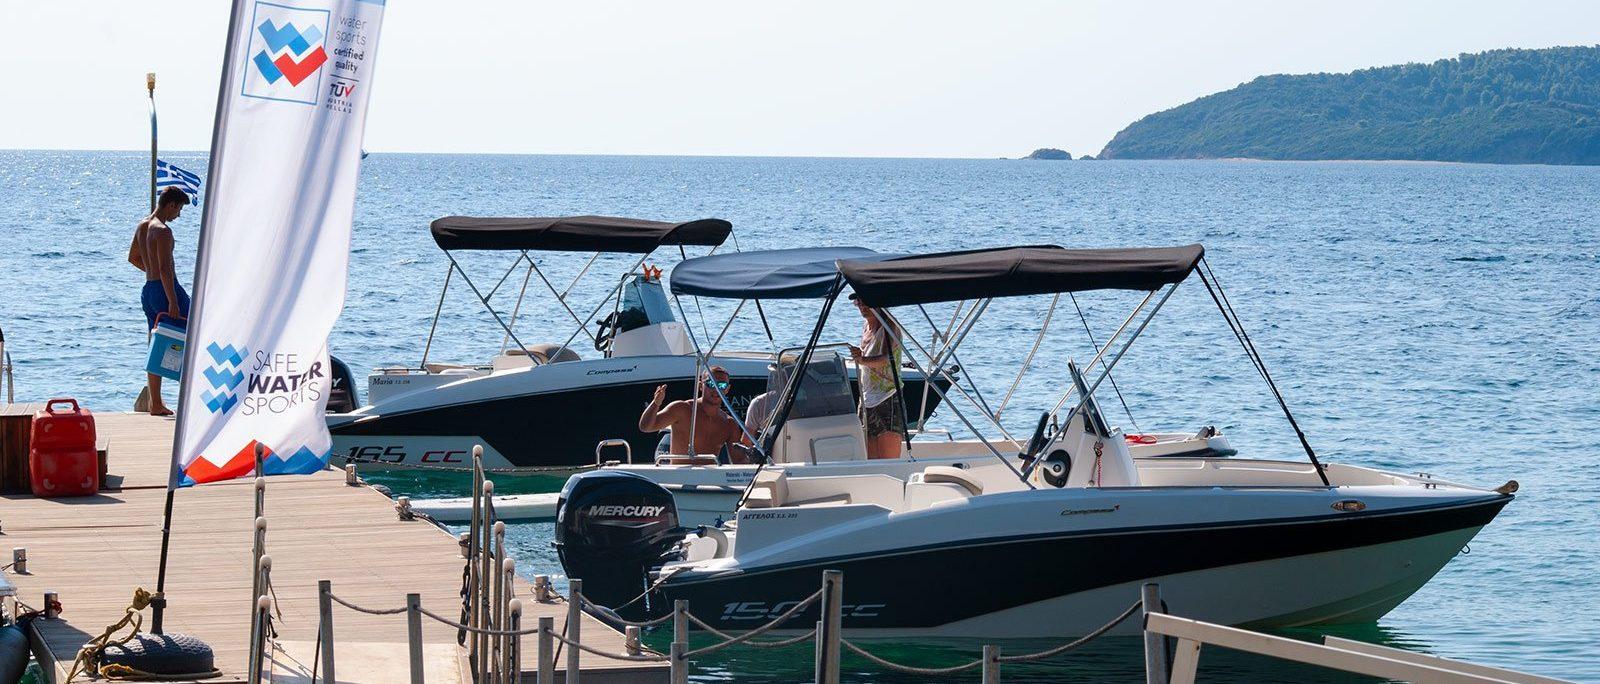 skiathos boats rentals ,ready to explore the beautiful beaches